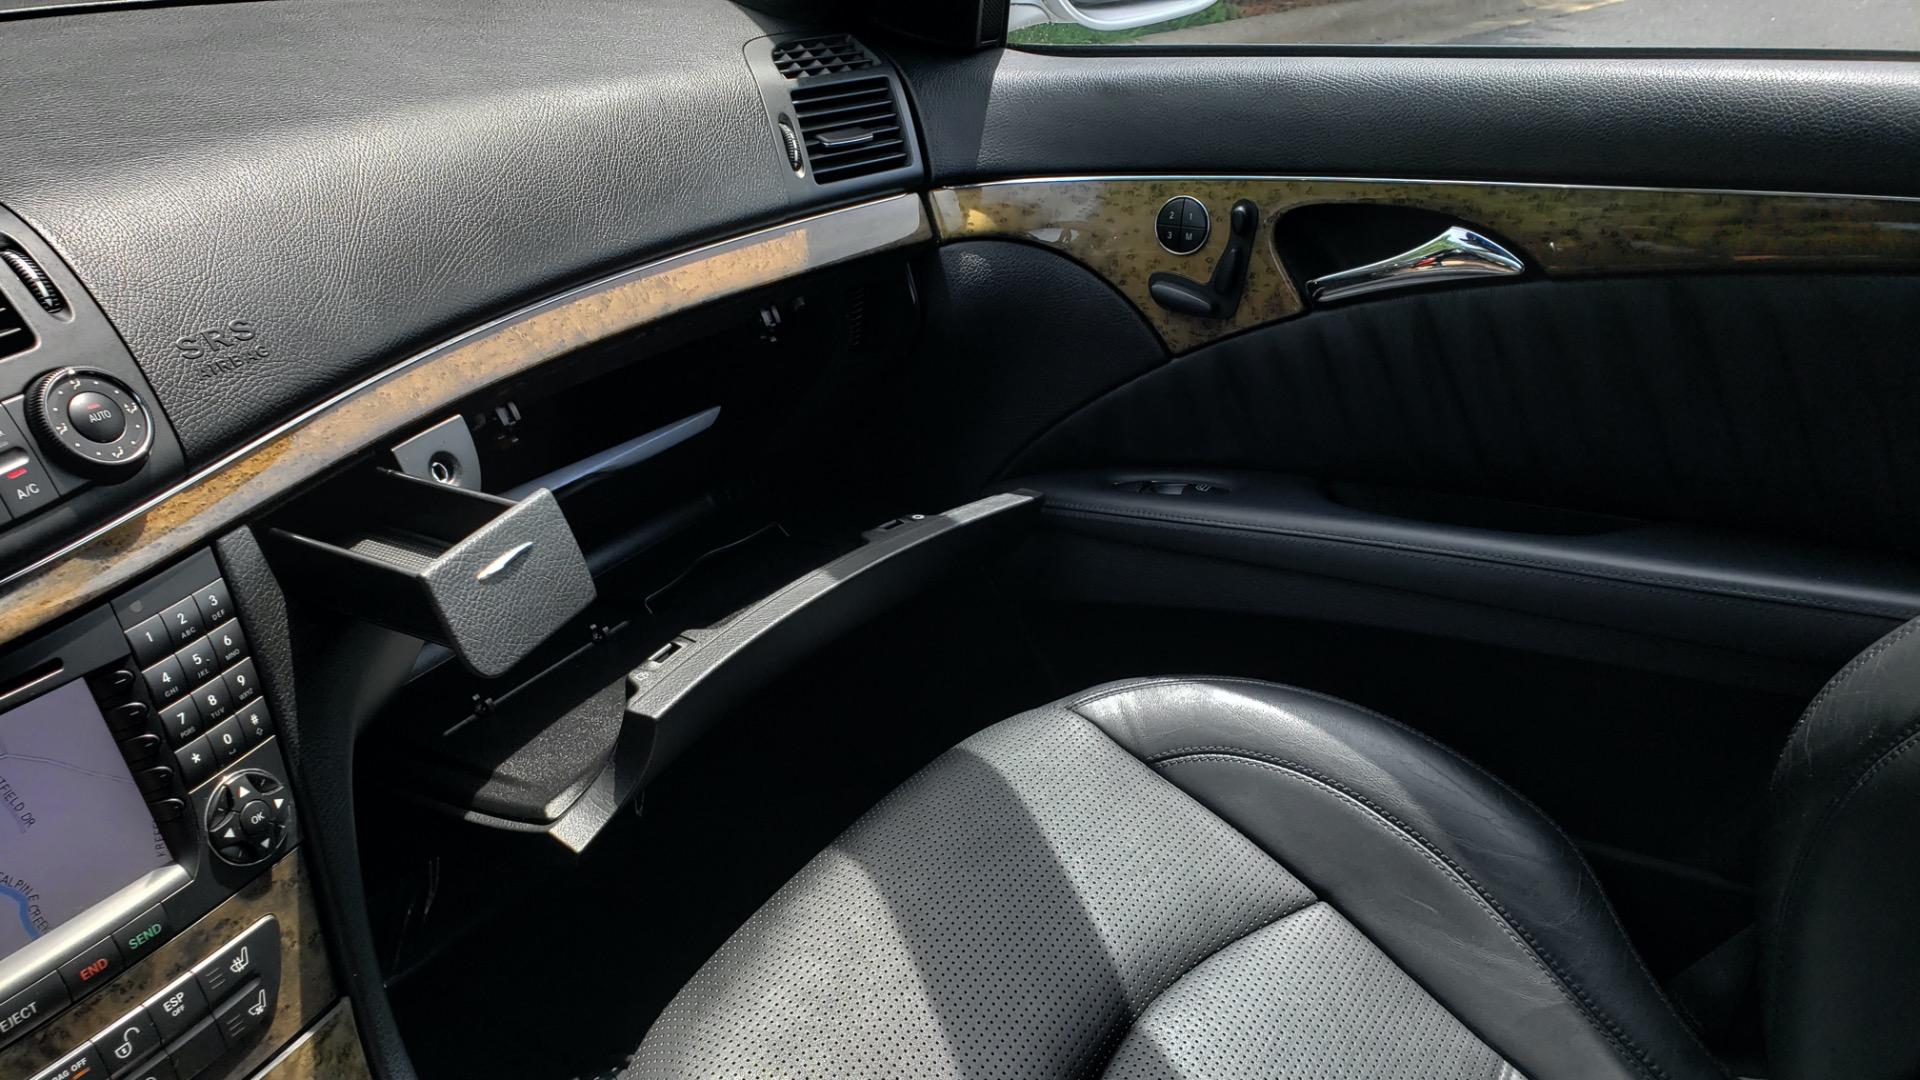 Used 2007 Mercedes-Benz E-Class E63 AMG WAGON / NAV / SUNROOF / HARMAN/KARDON for sale $29,000 at Formula Imports in Charlotte NC 28227 56